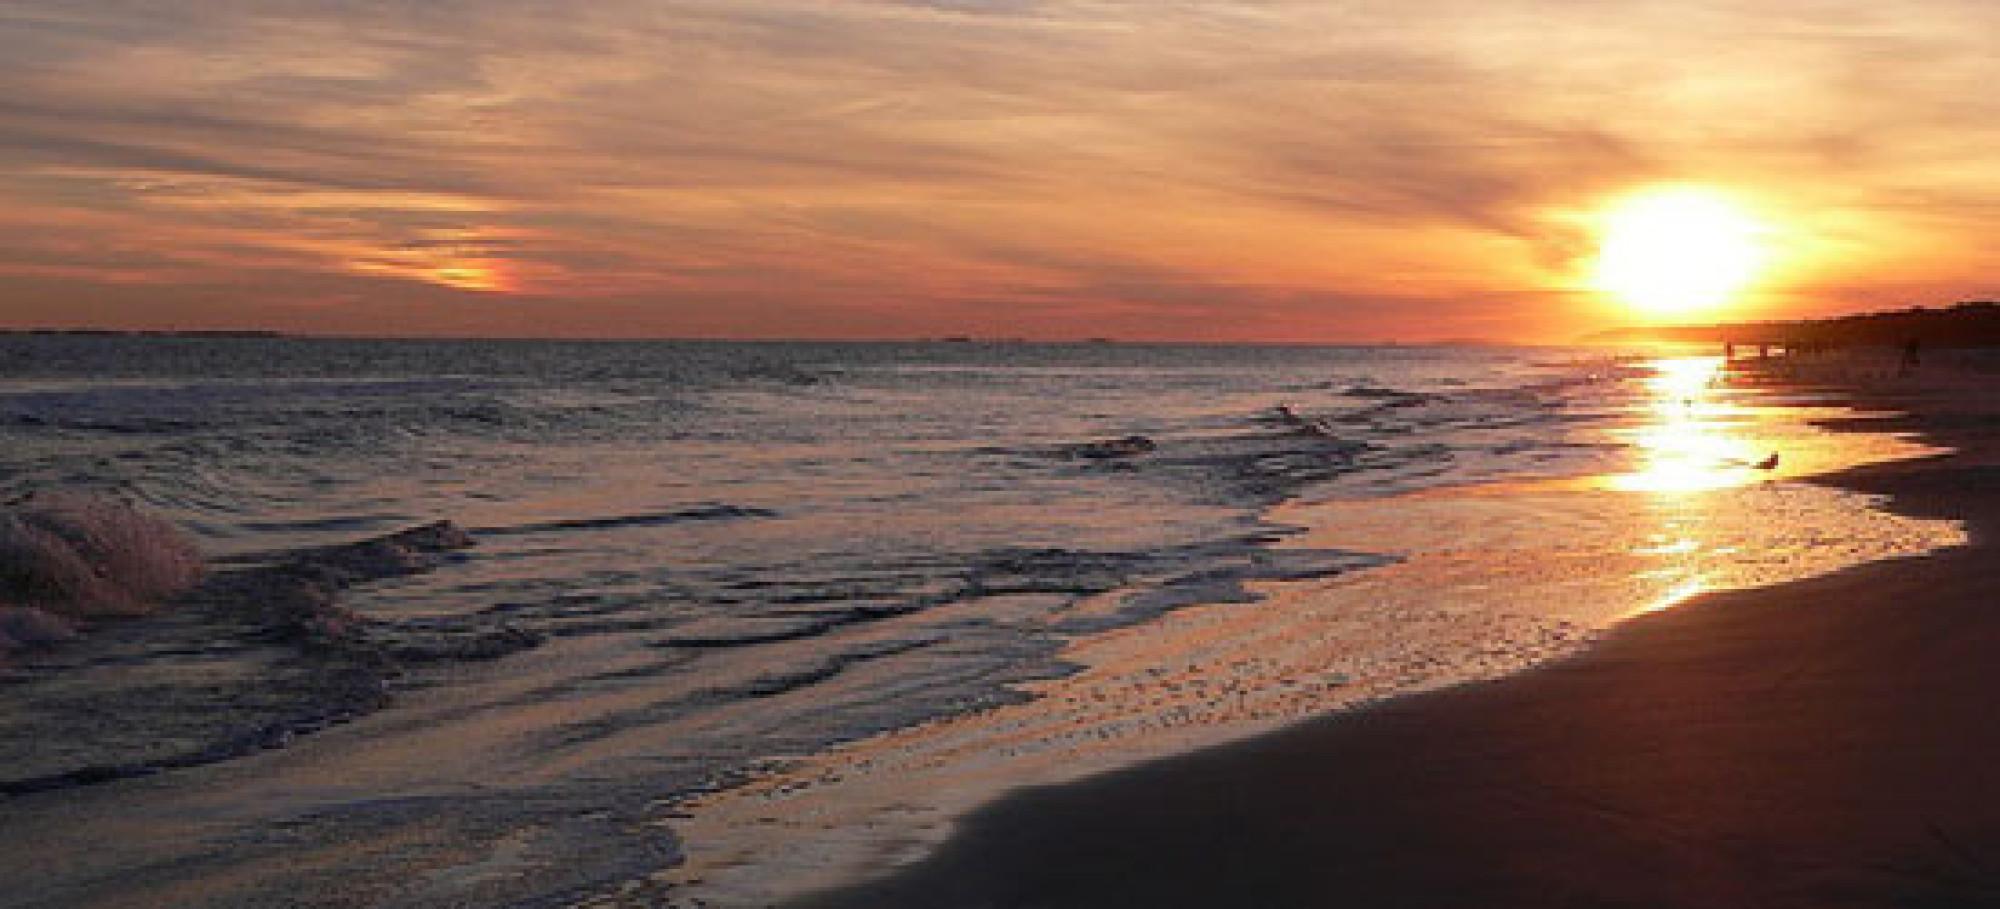 Hilton Head Island Water Temperatures In October